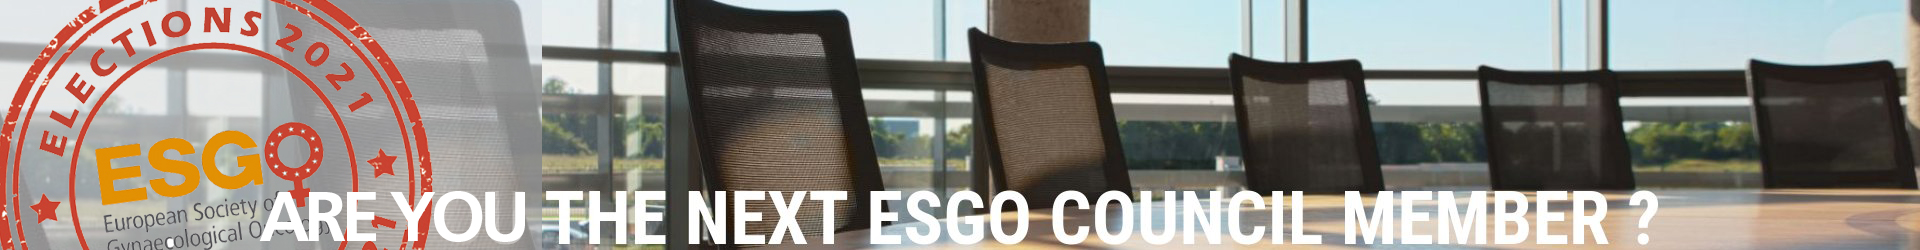 ESGO-Council4_2021